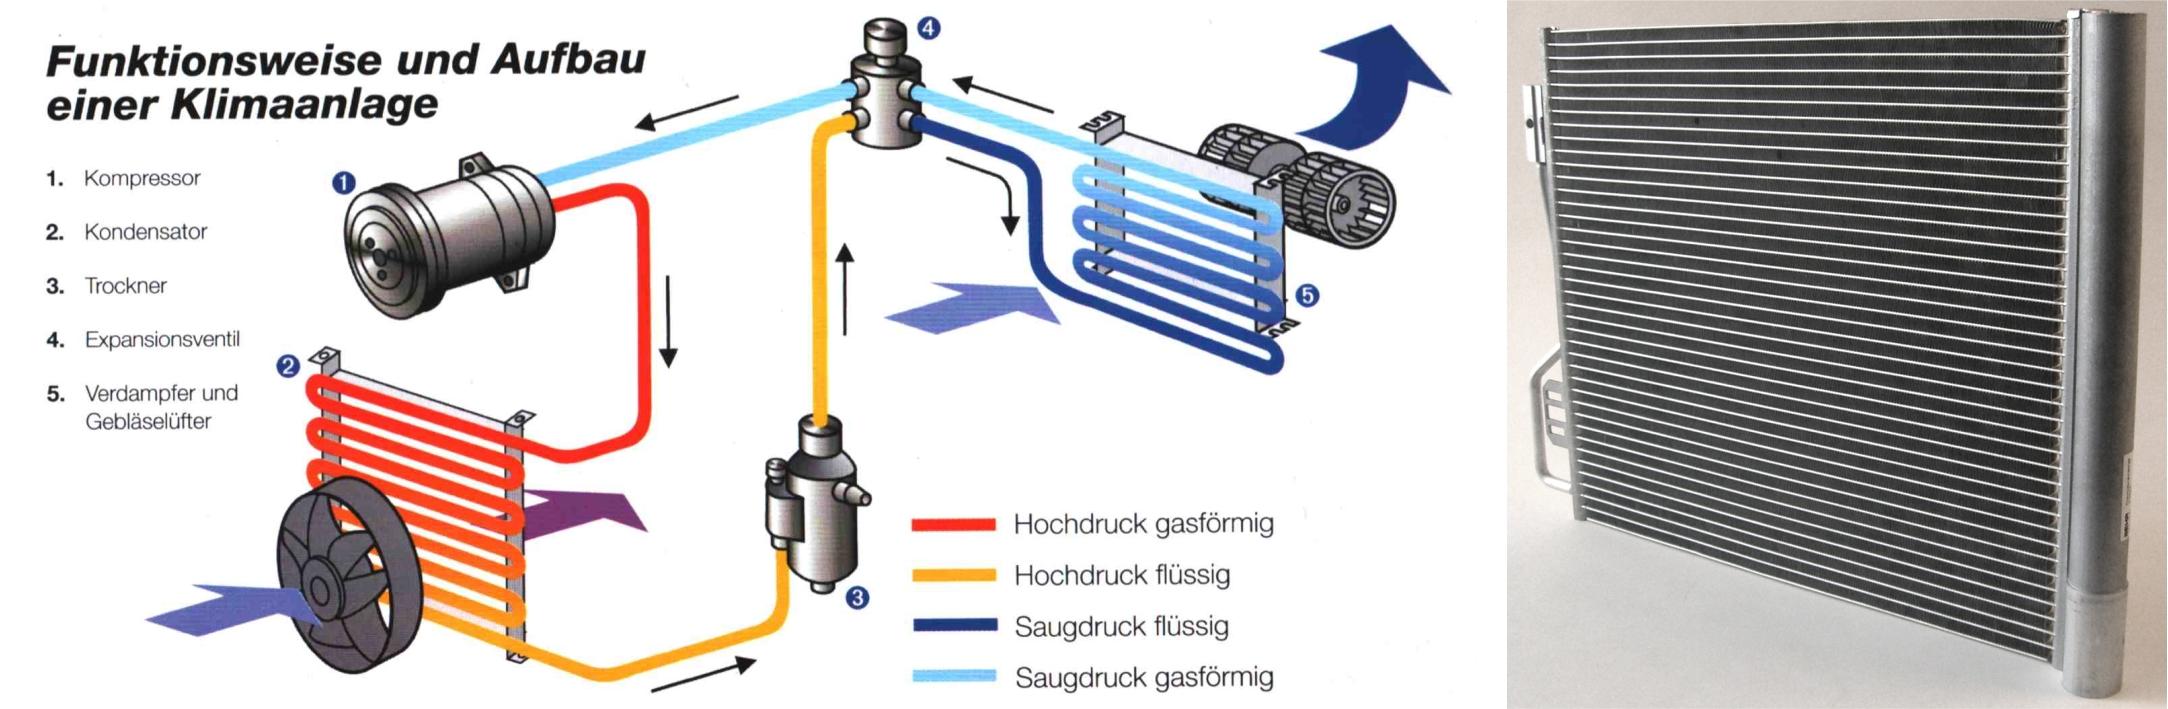 KIT - Institute of Thermal Process EngineeringMitarbeiter | People ...